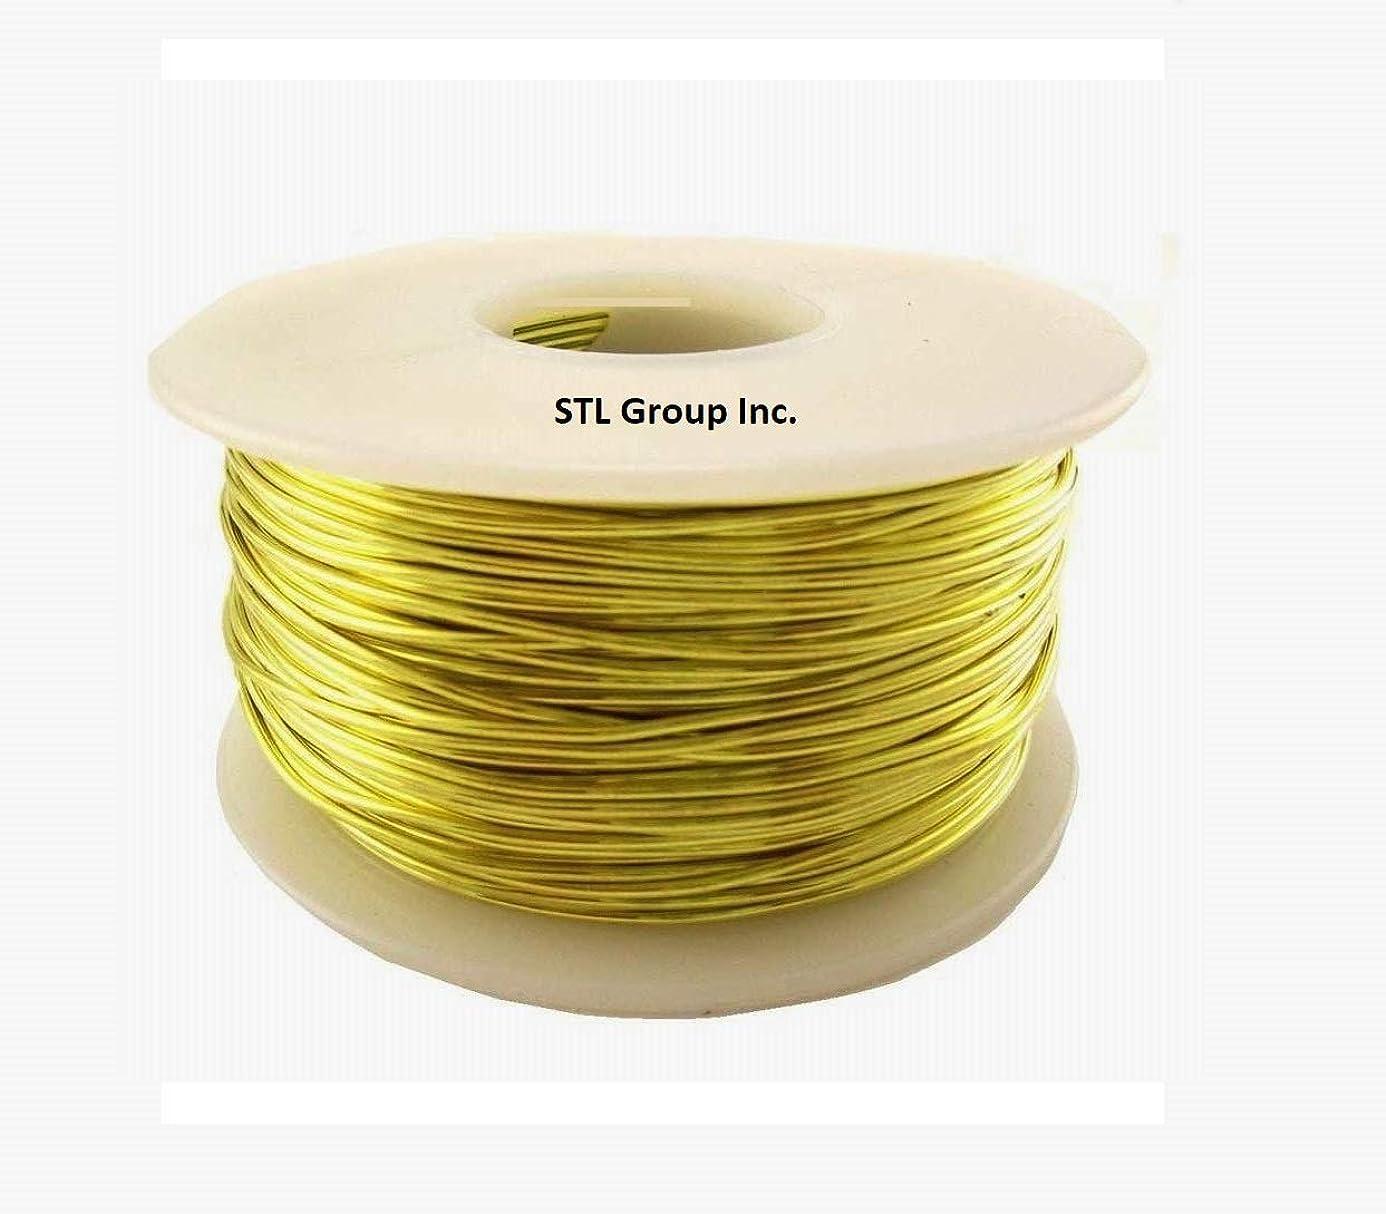 26 ga Brass Round Wire 1 lb = 1260 Ft. Spool / Soft Yellow #260 Brass rca4917819